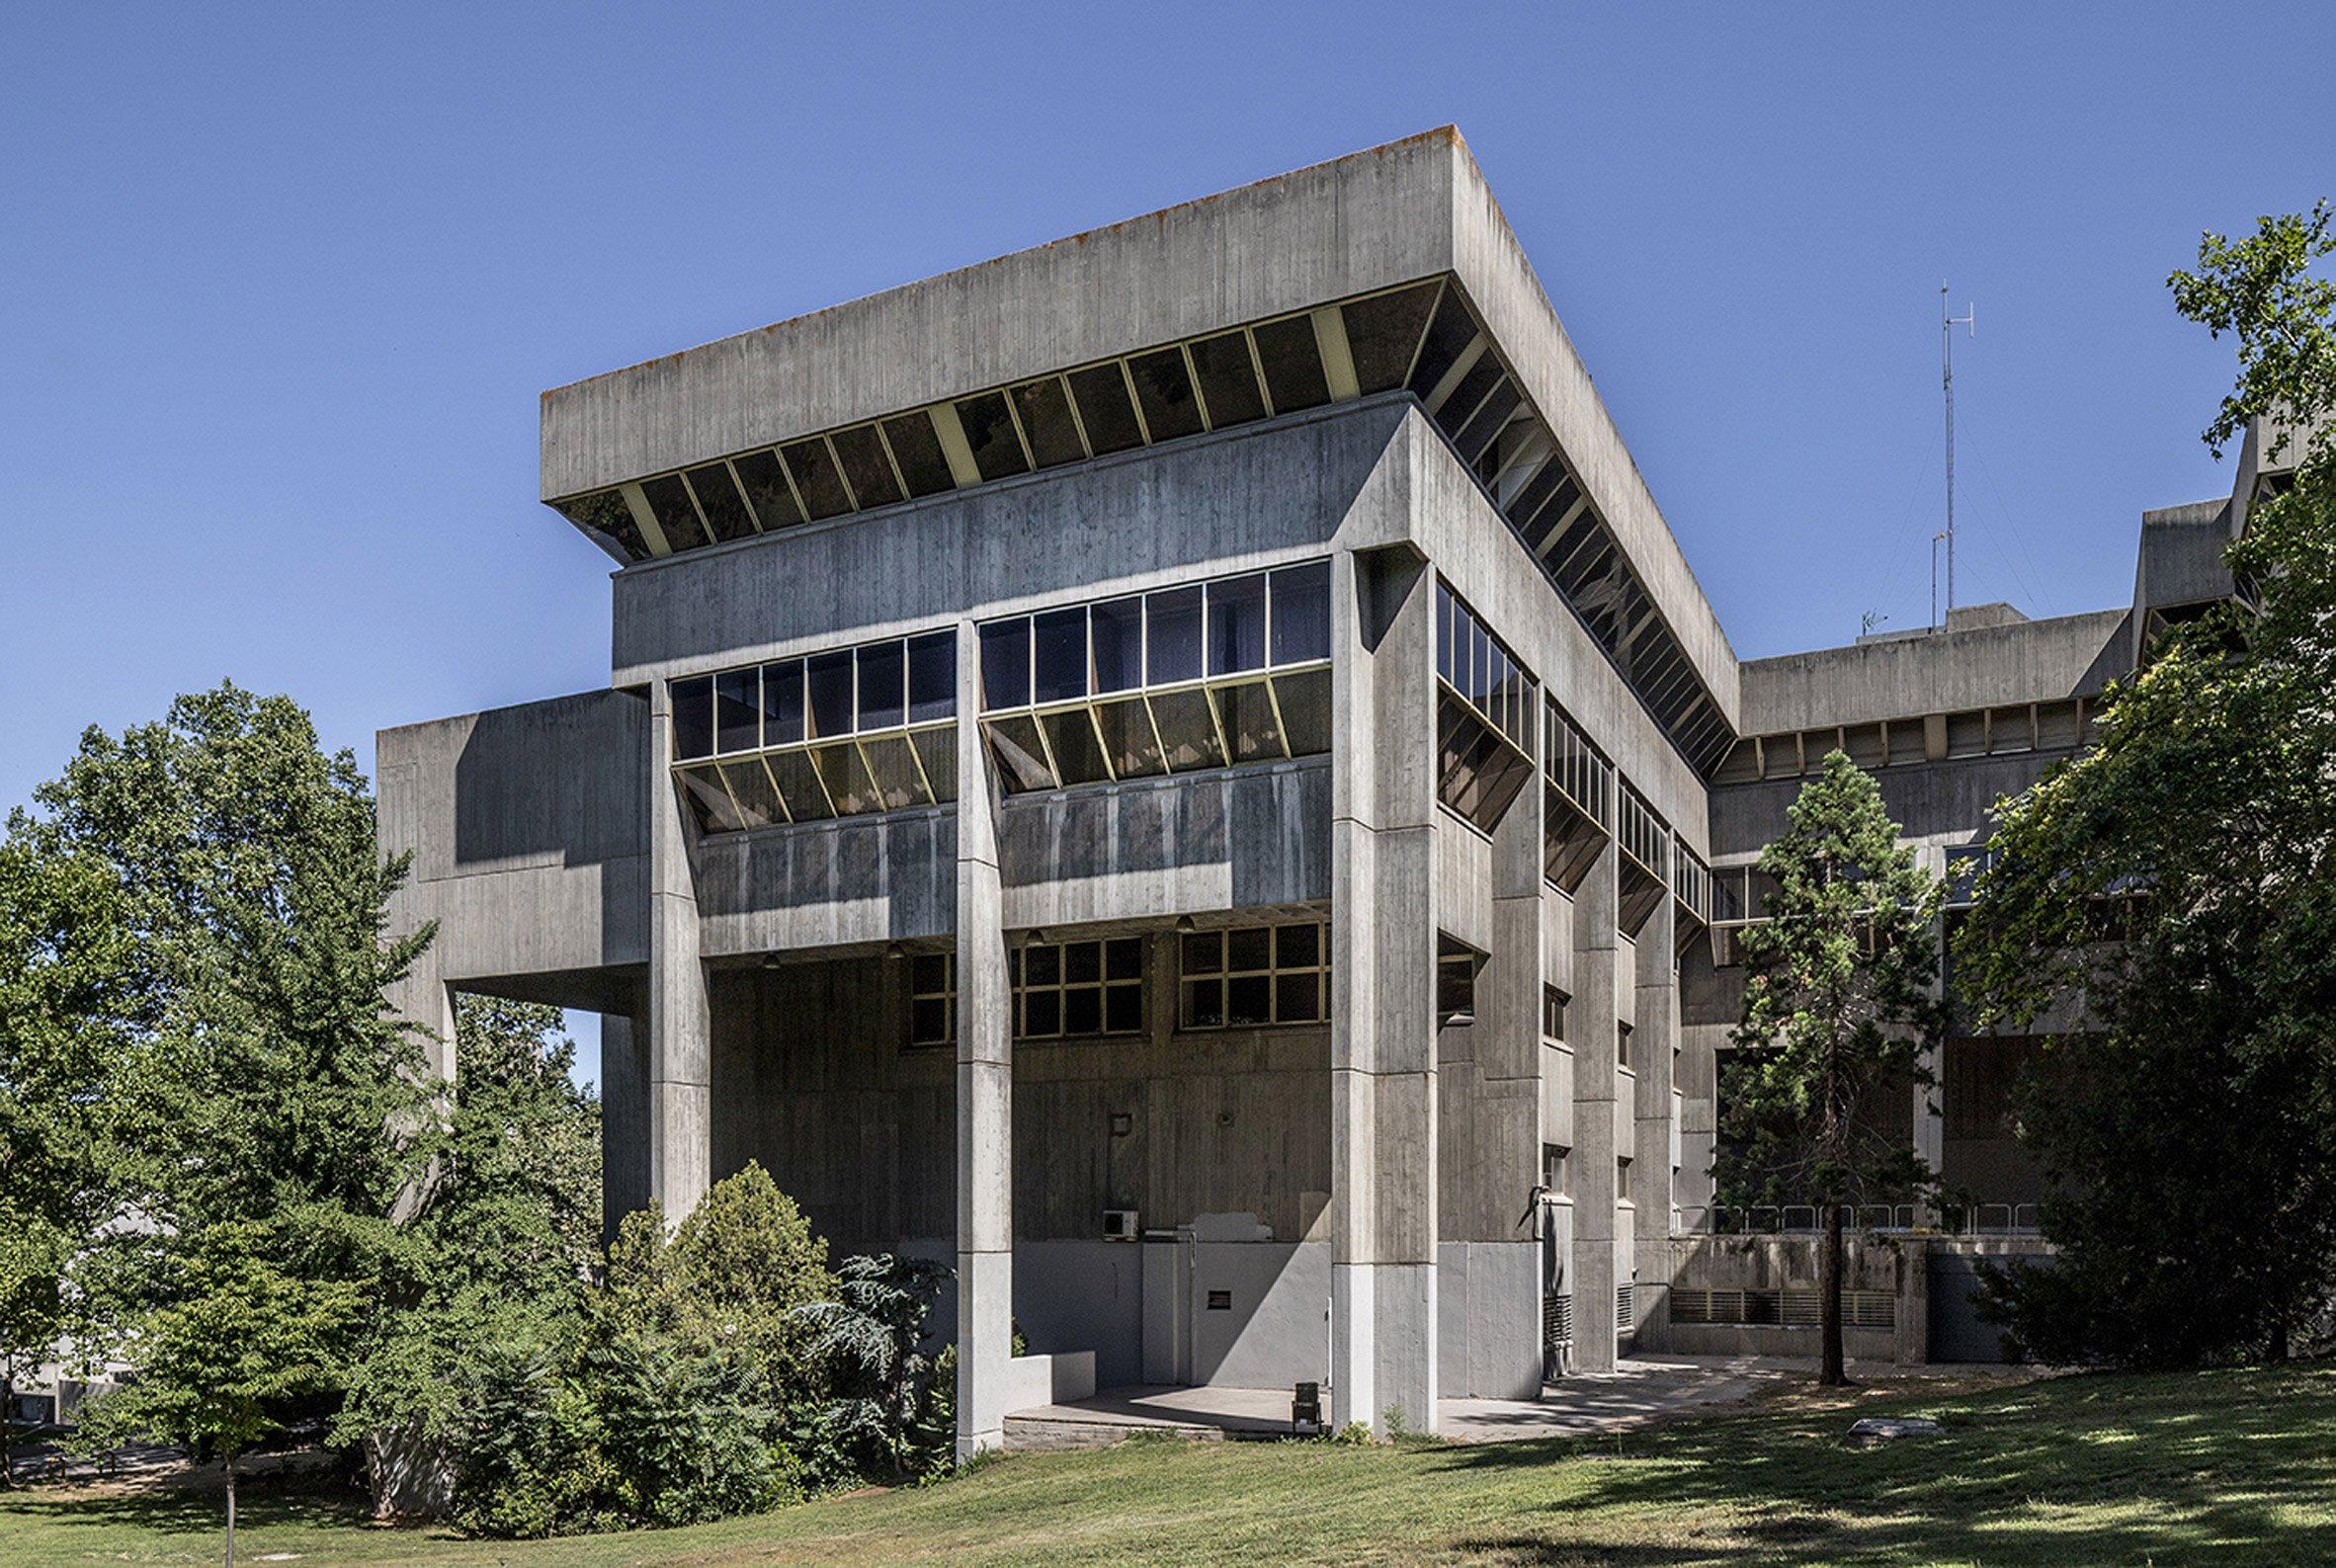 Madrid's brutalist architecture: Department of Information Sciences